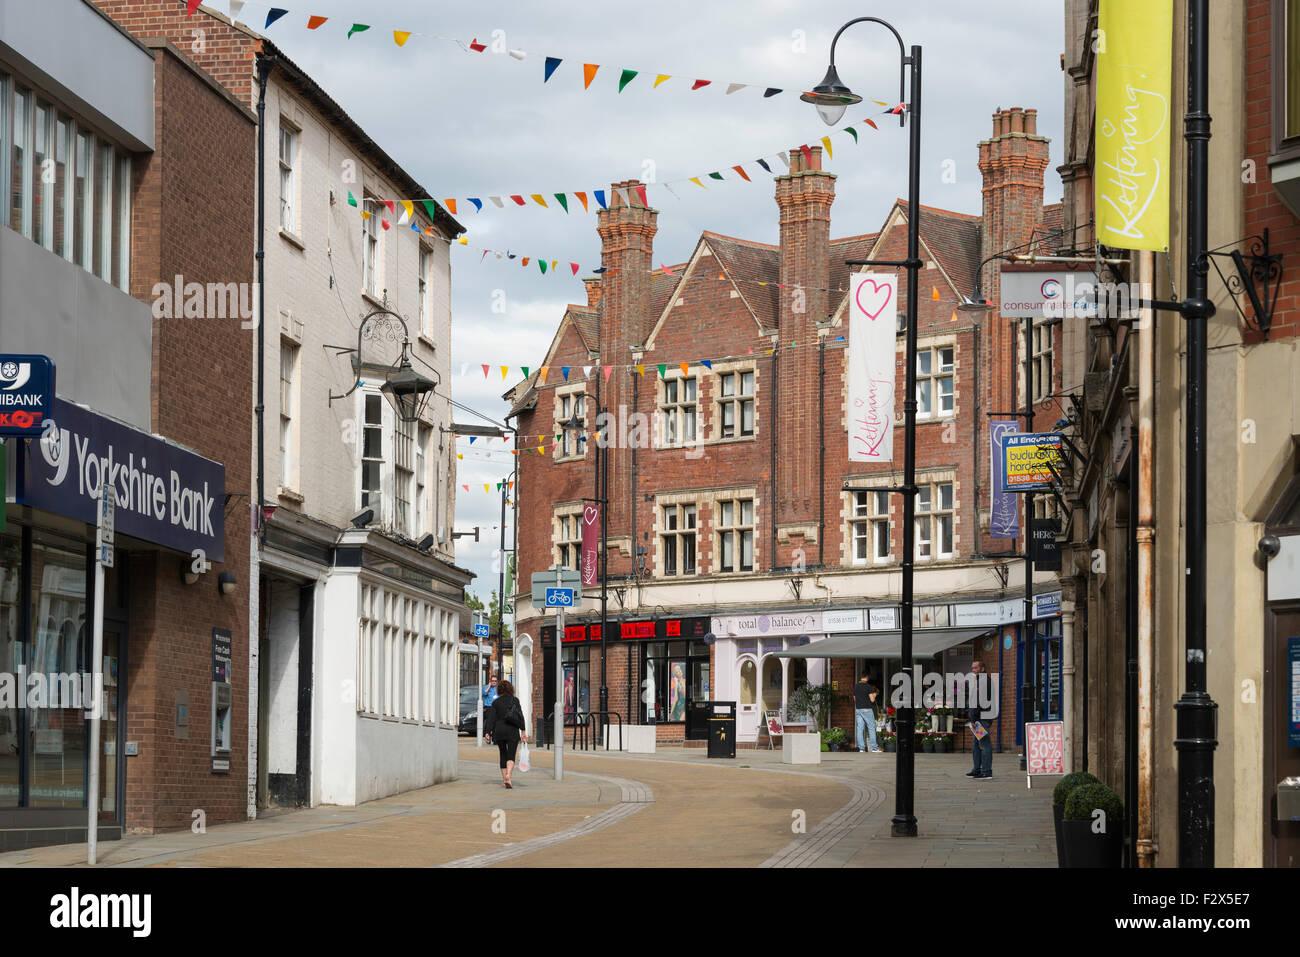 kettering, northamptonshire, england stock photo, royalty free